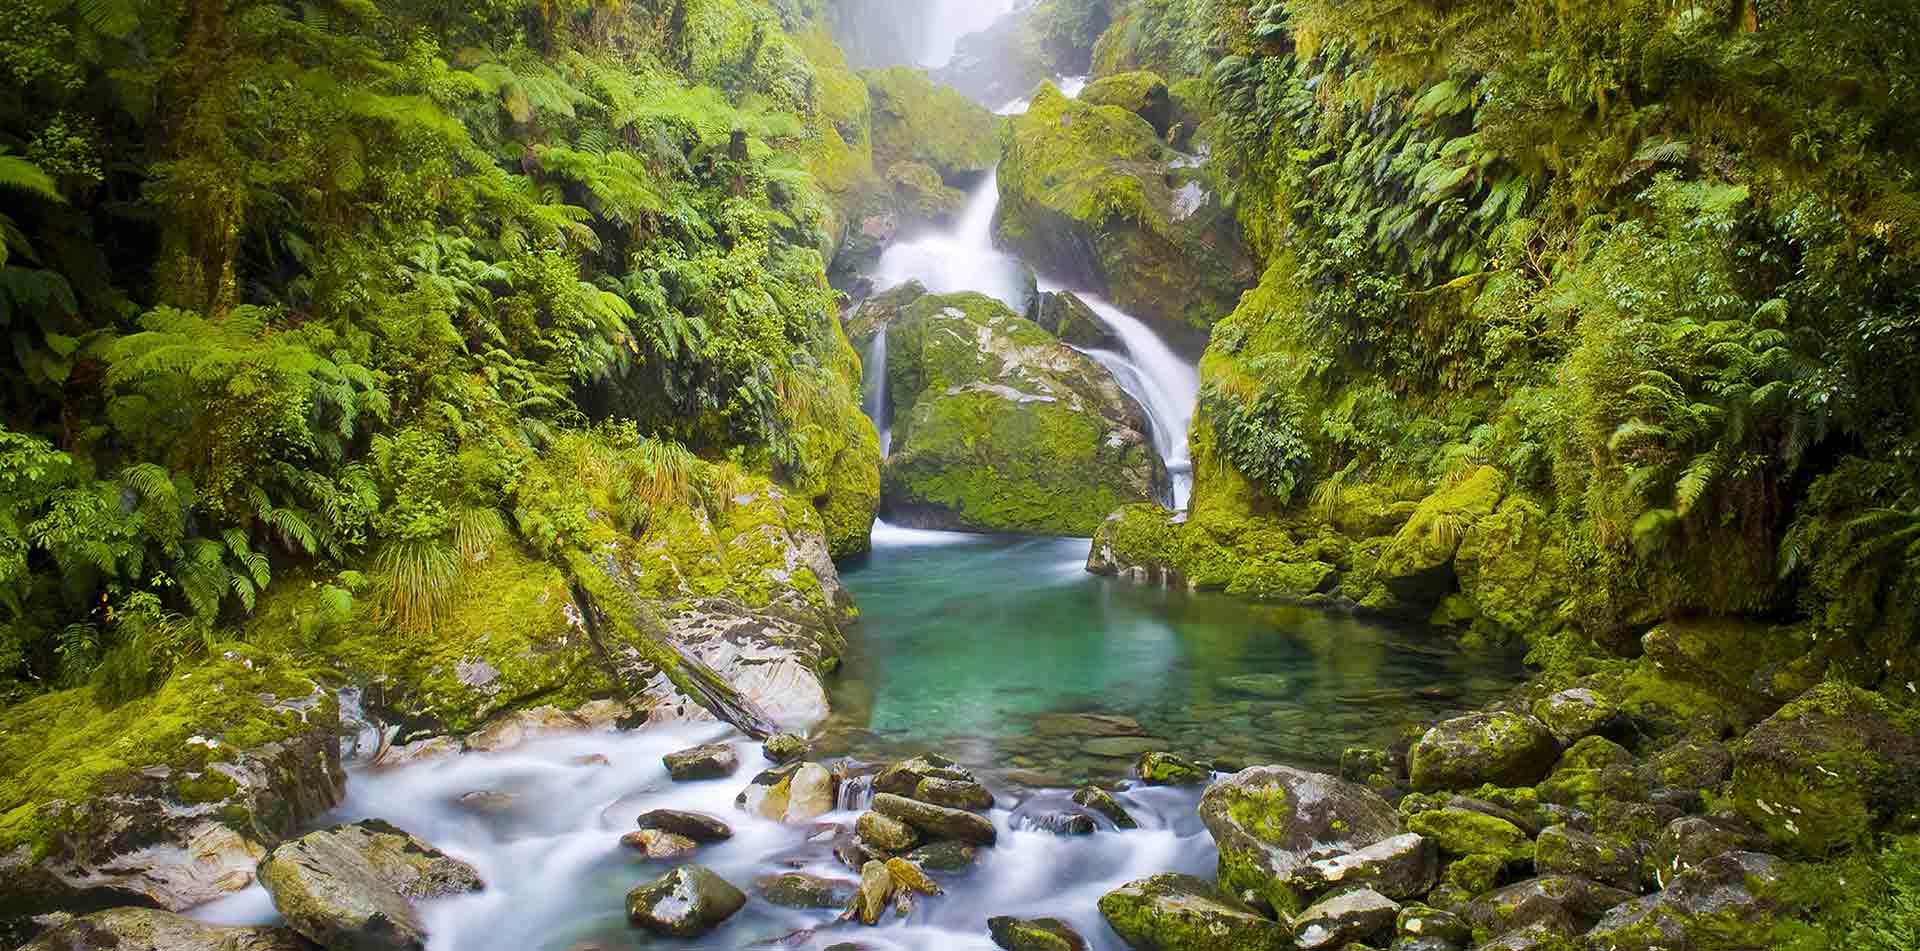 Mackay Falls, Milford Track, New Zealand